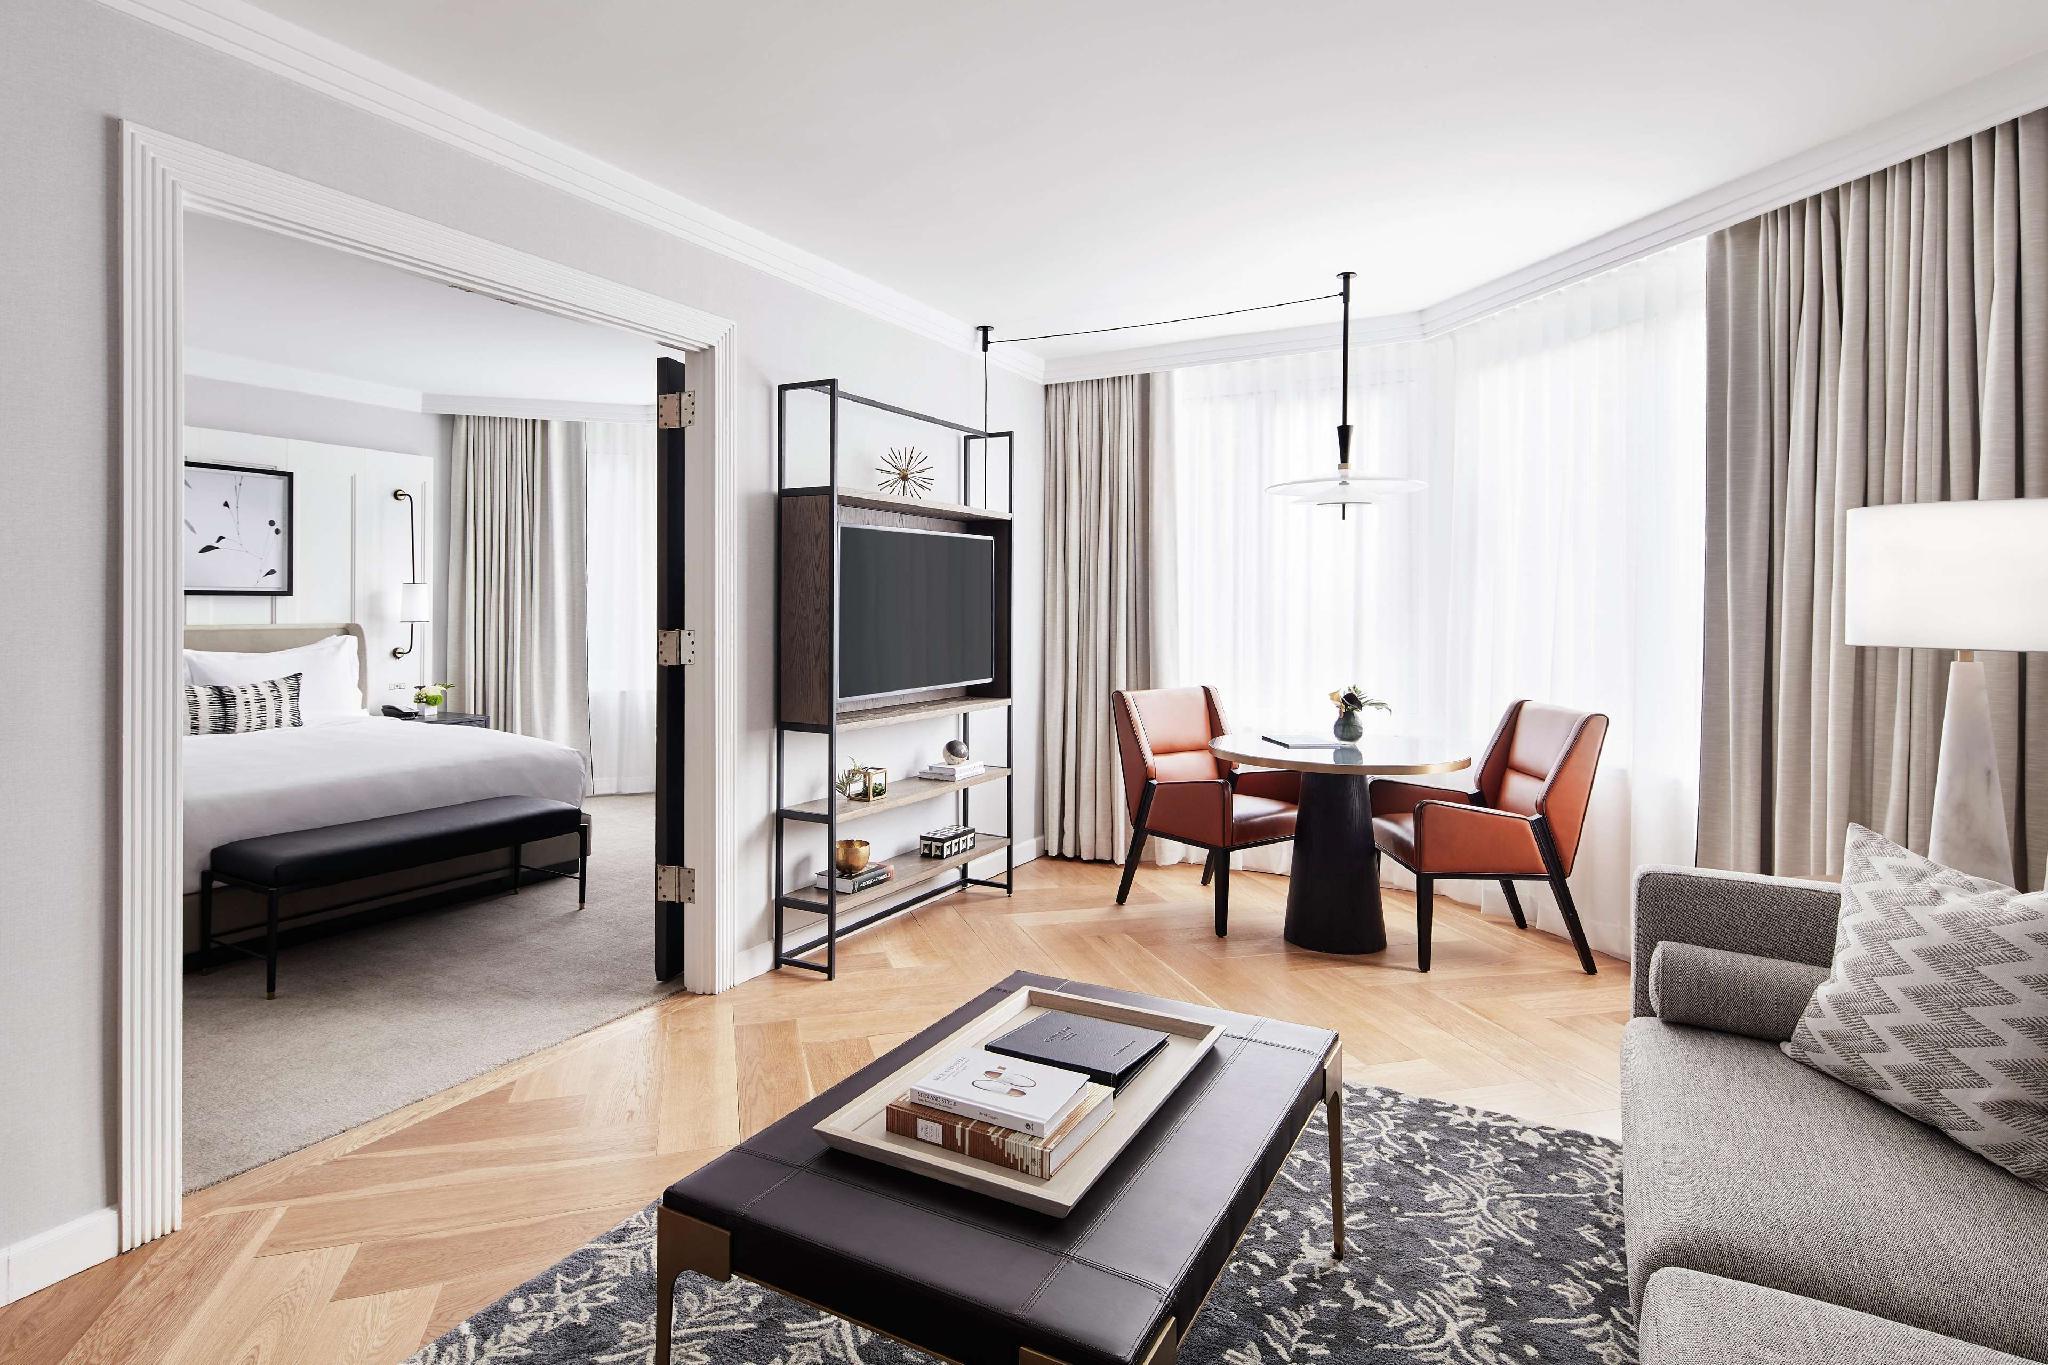 Conrad New Tork Midtown - suite